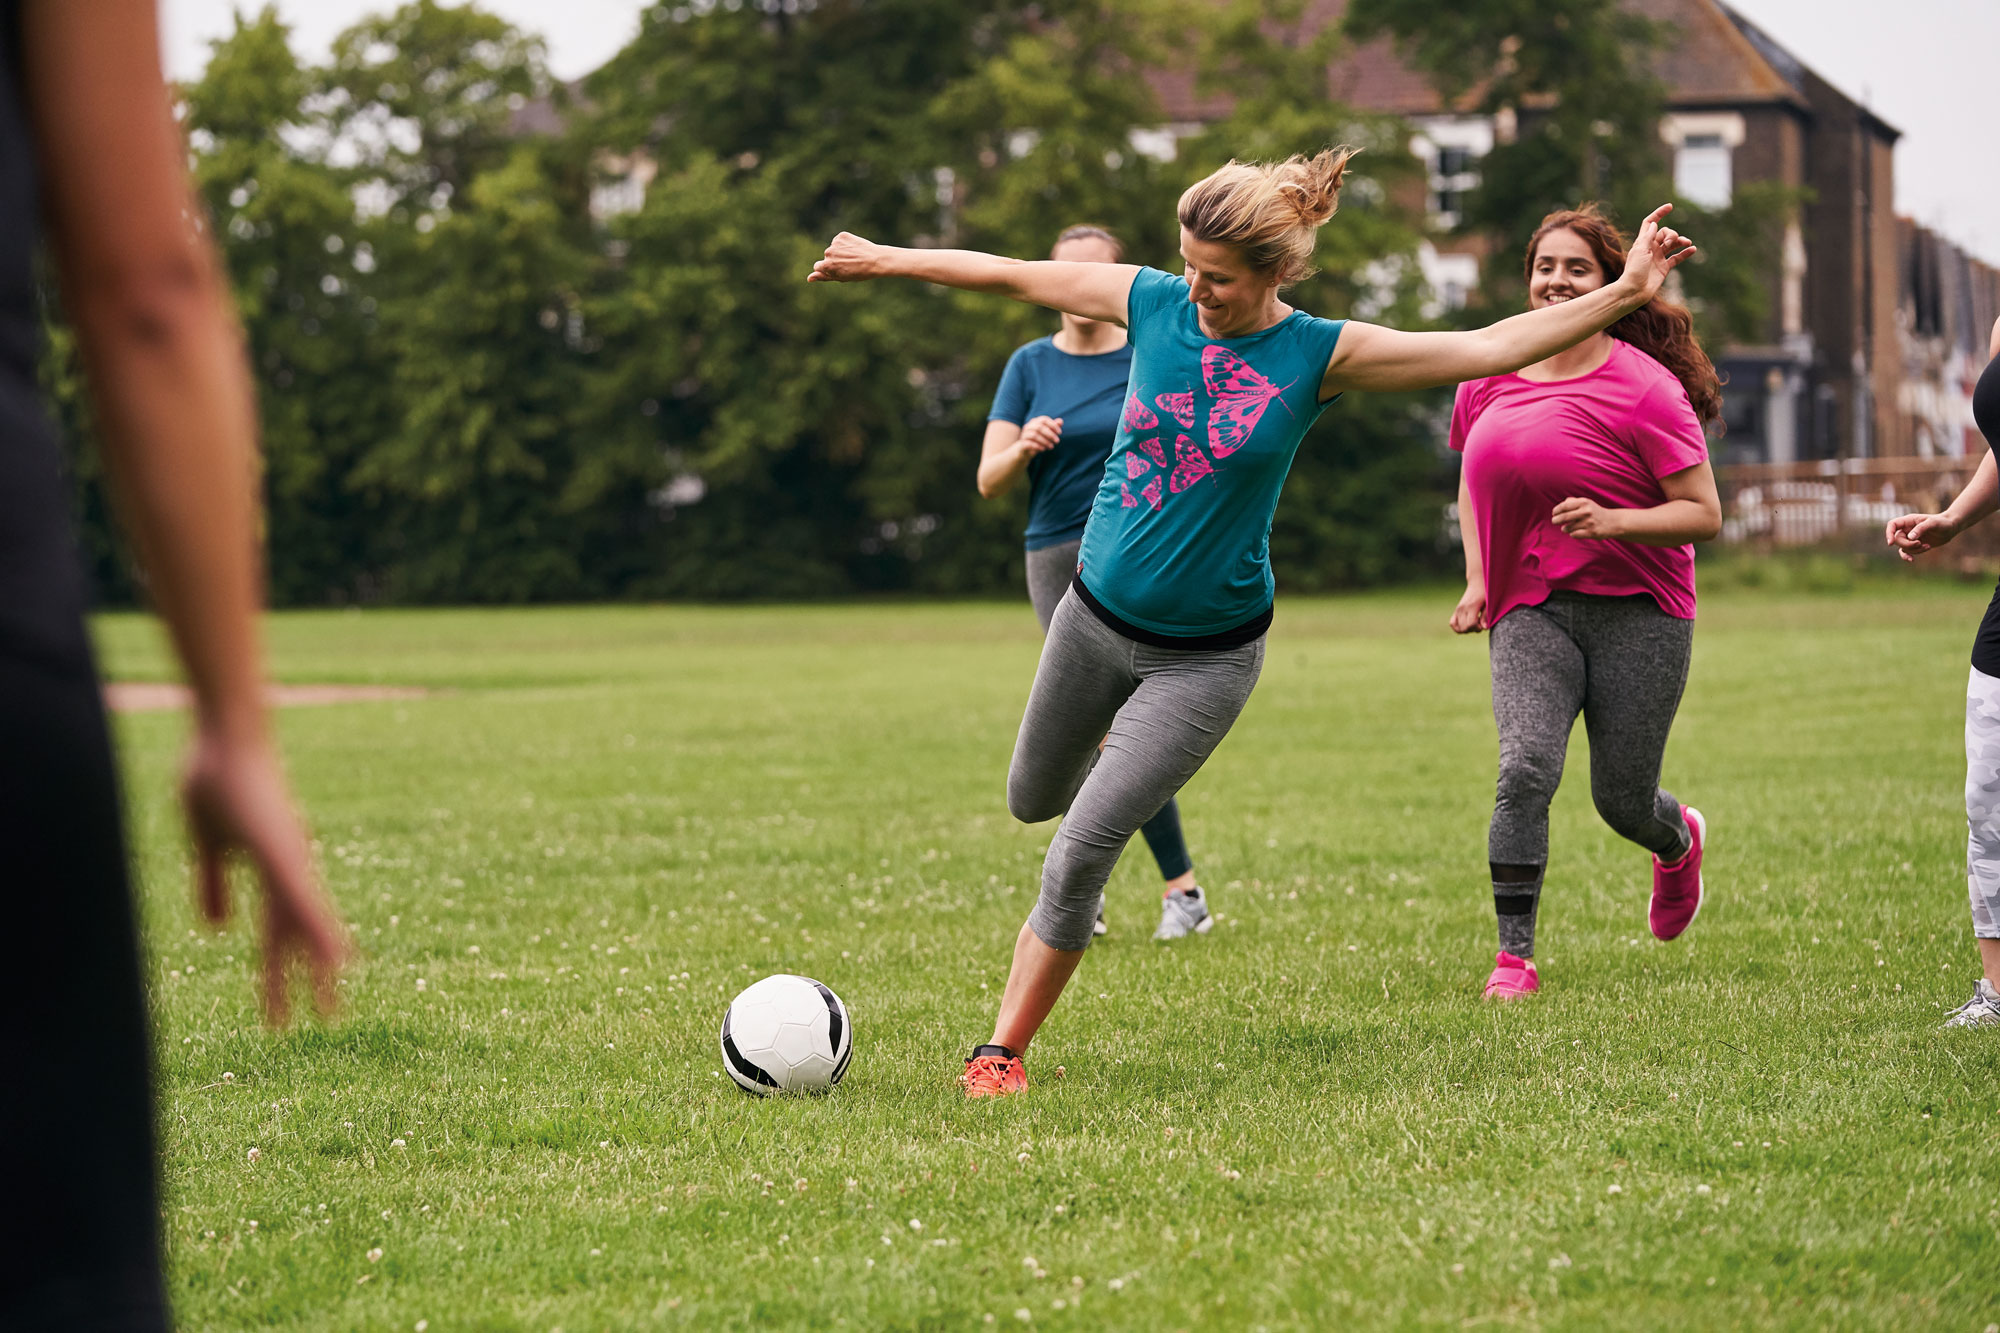 Woman kicking football